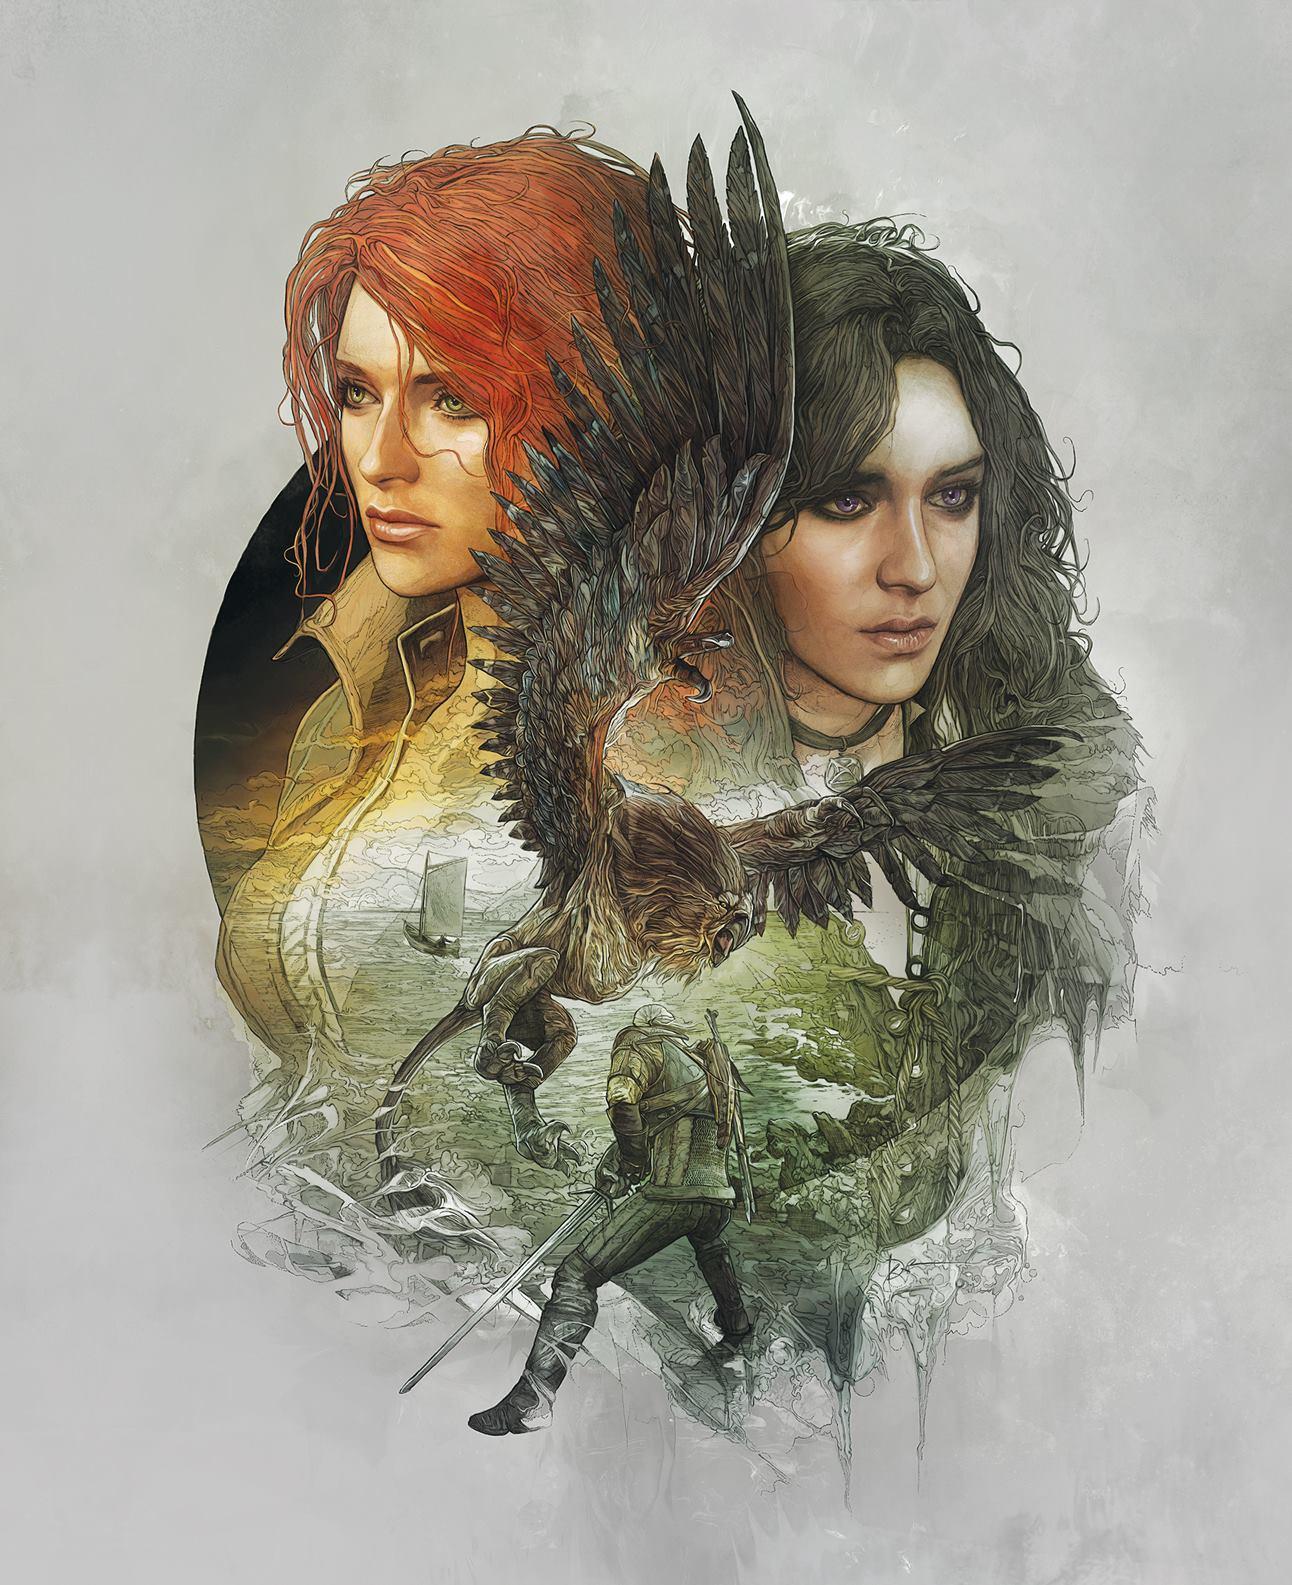 The Witcher 3 Novigrad Cover Art